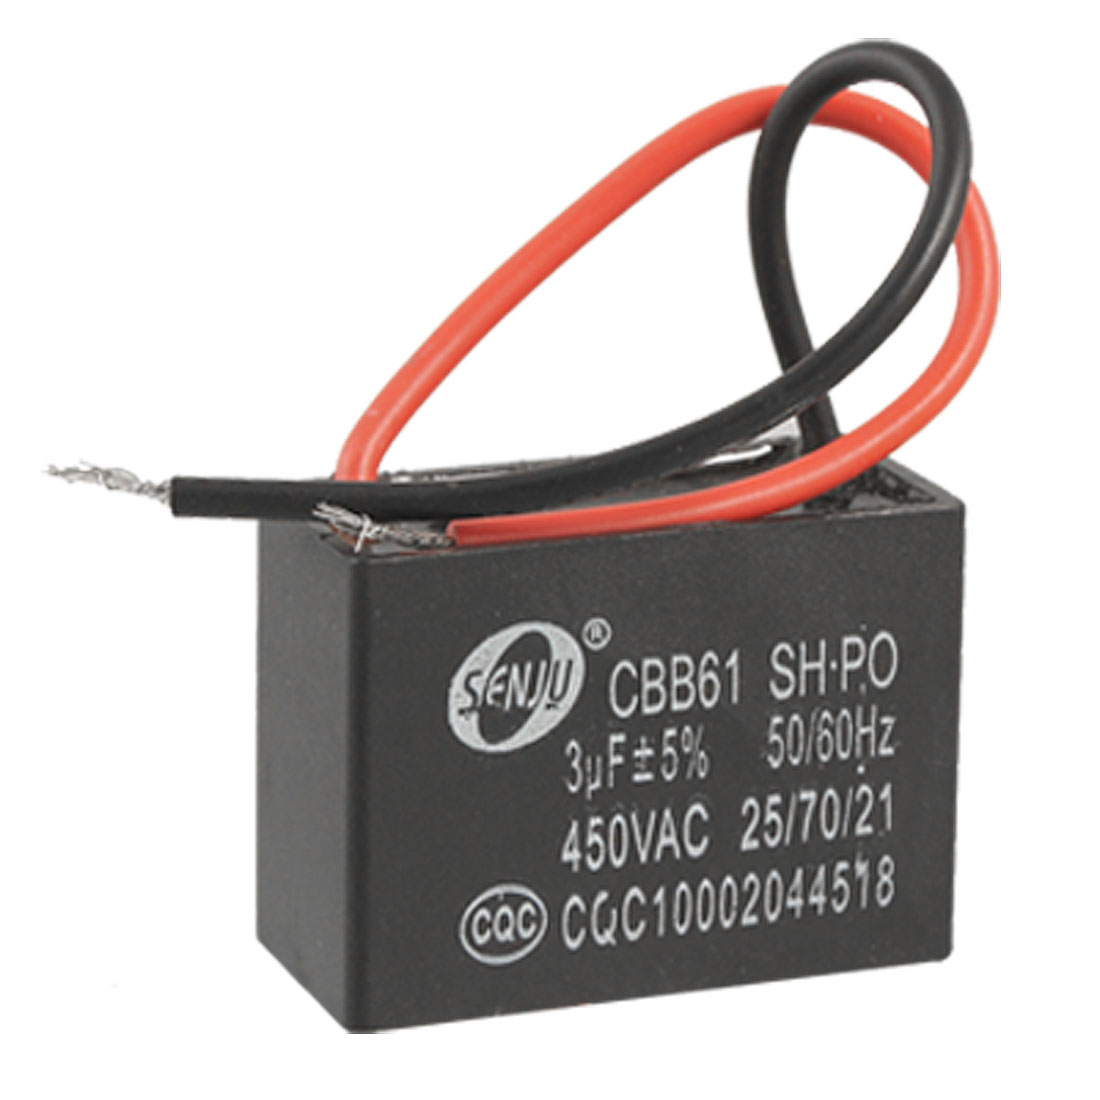 CBB61 Ceiling Fan 2 Wires Motor Run Capacitor AC 450V 3uF